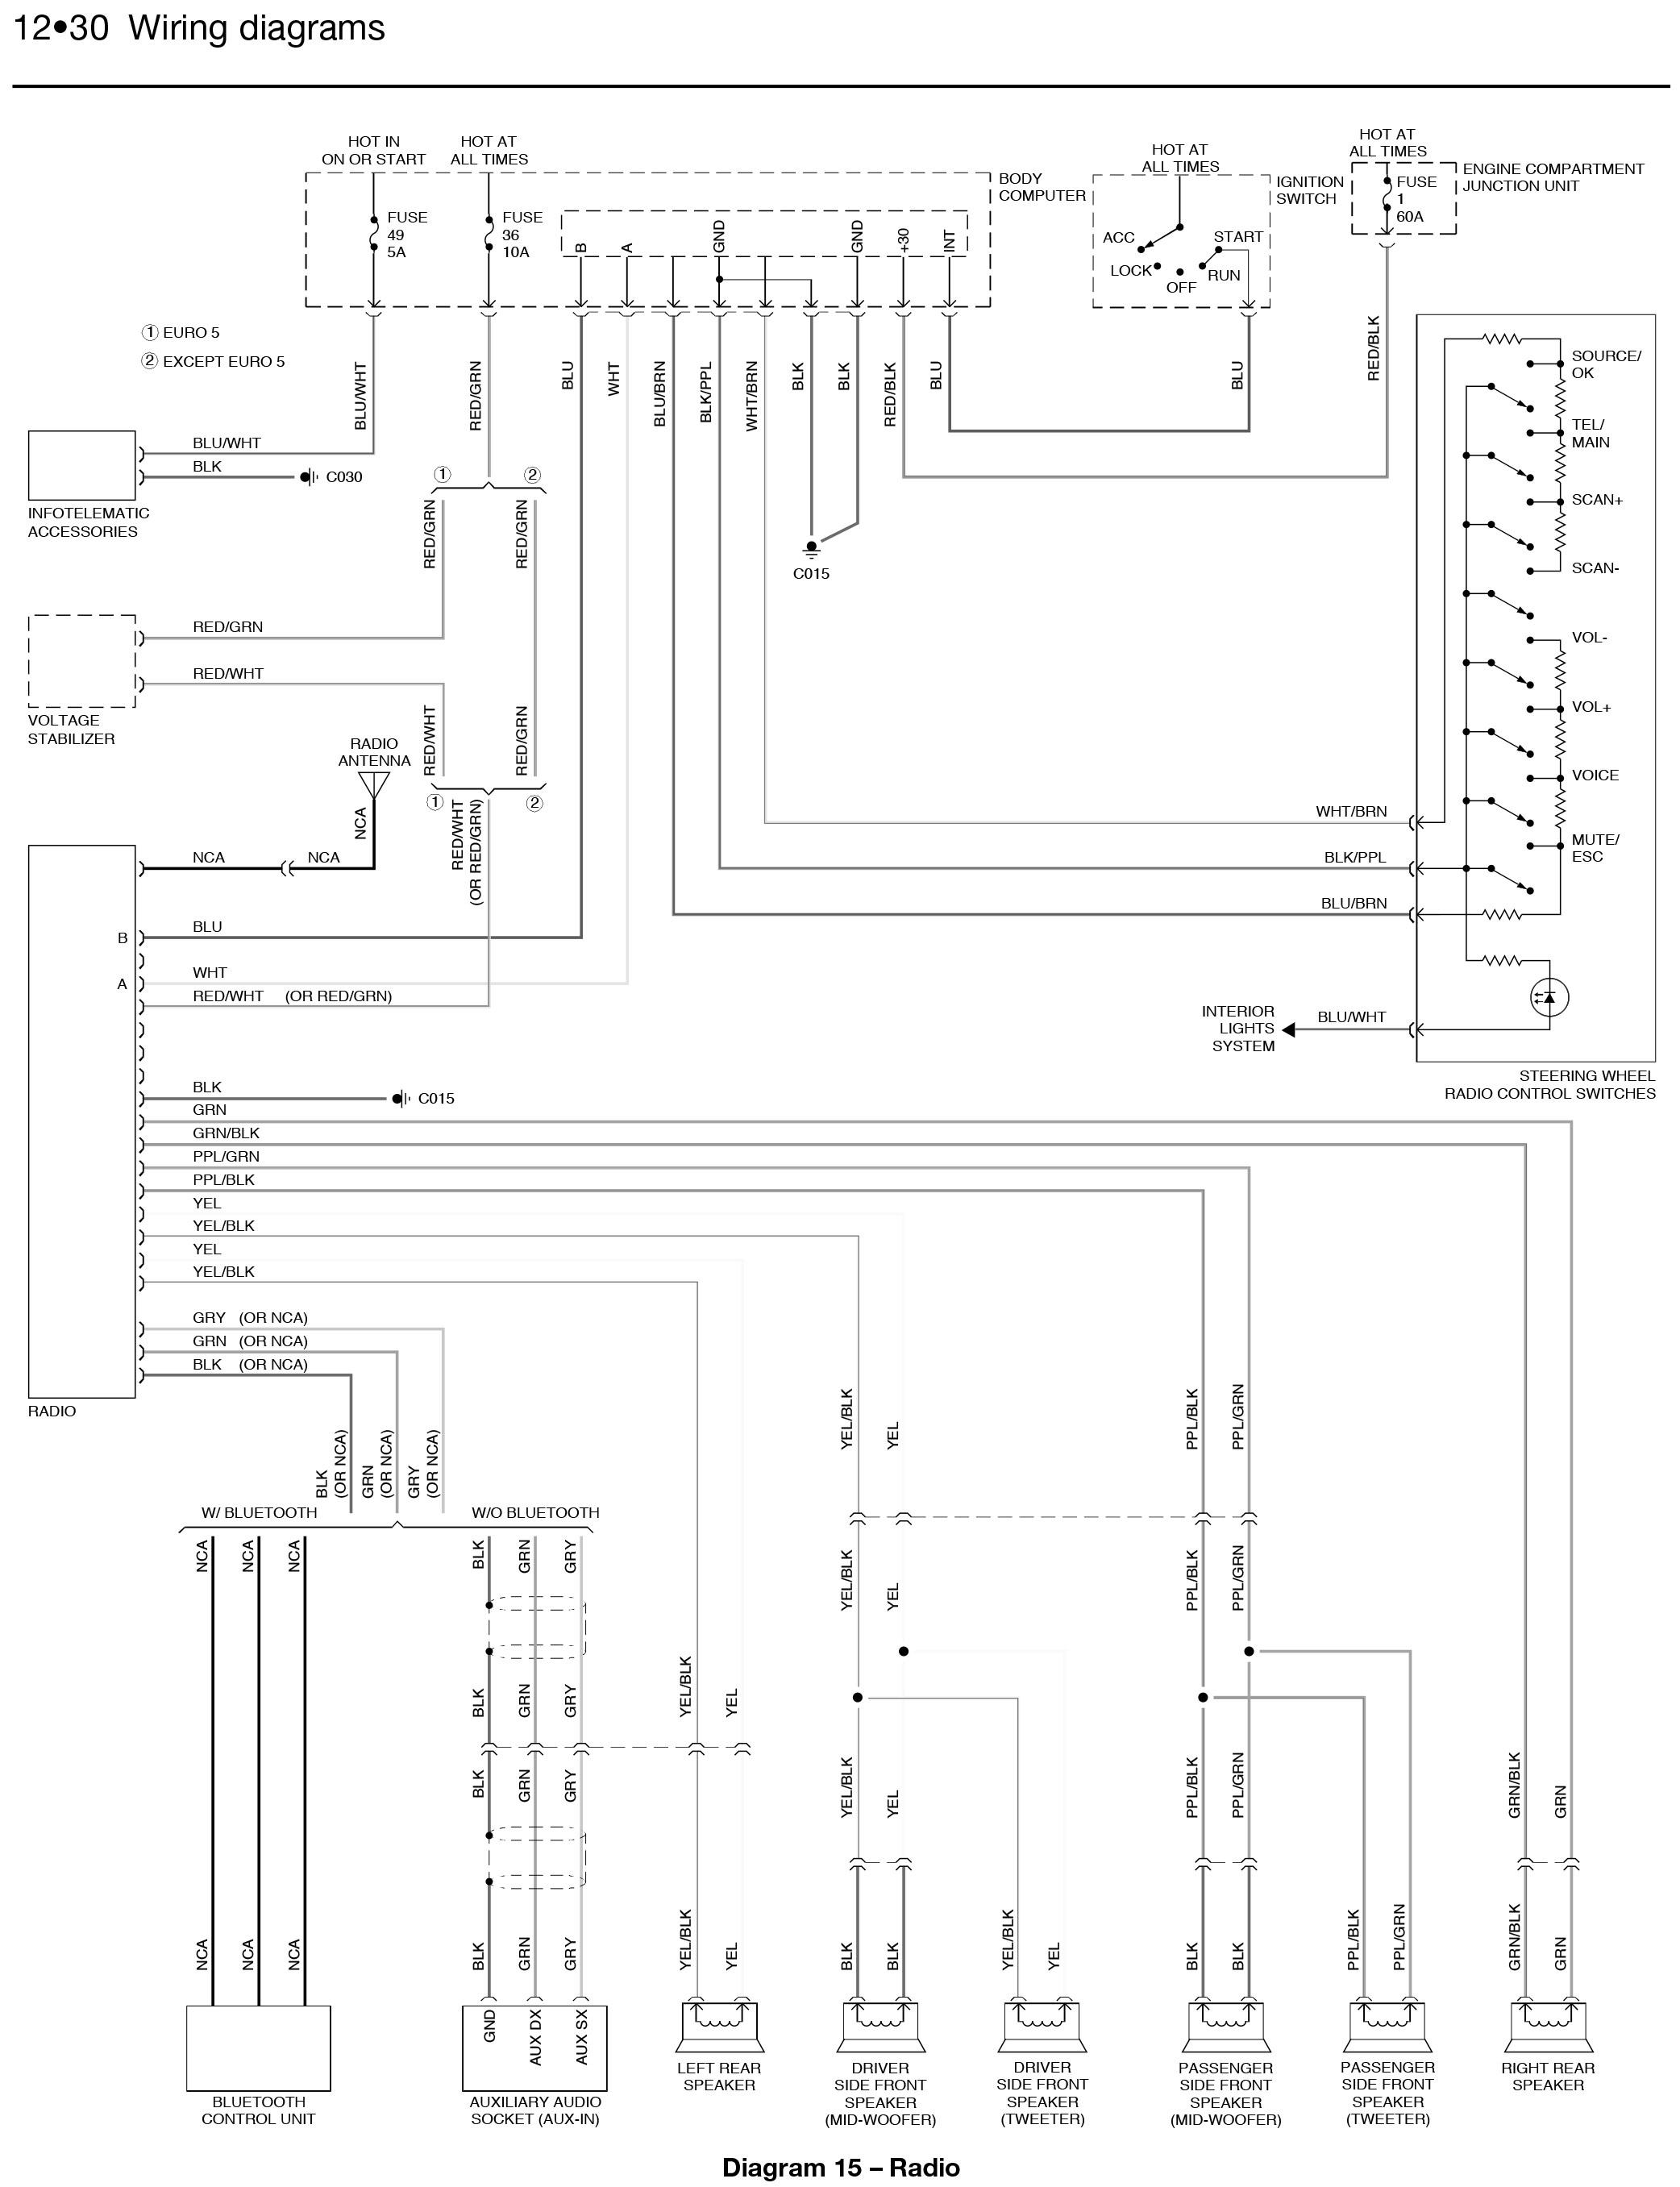 ford ka wiring diagram 1997 honda civic stereo great installation of heater control library rh 31 bloxhuette de fiesta 2010 electric windows